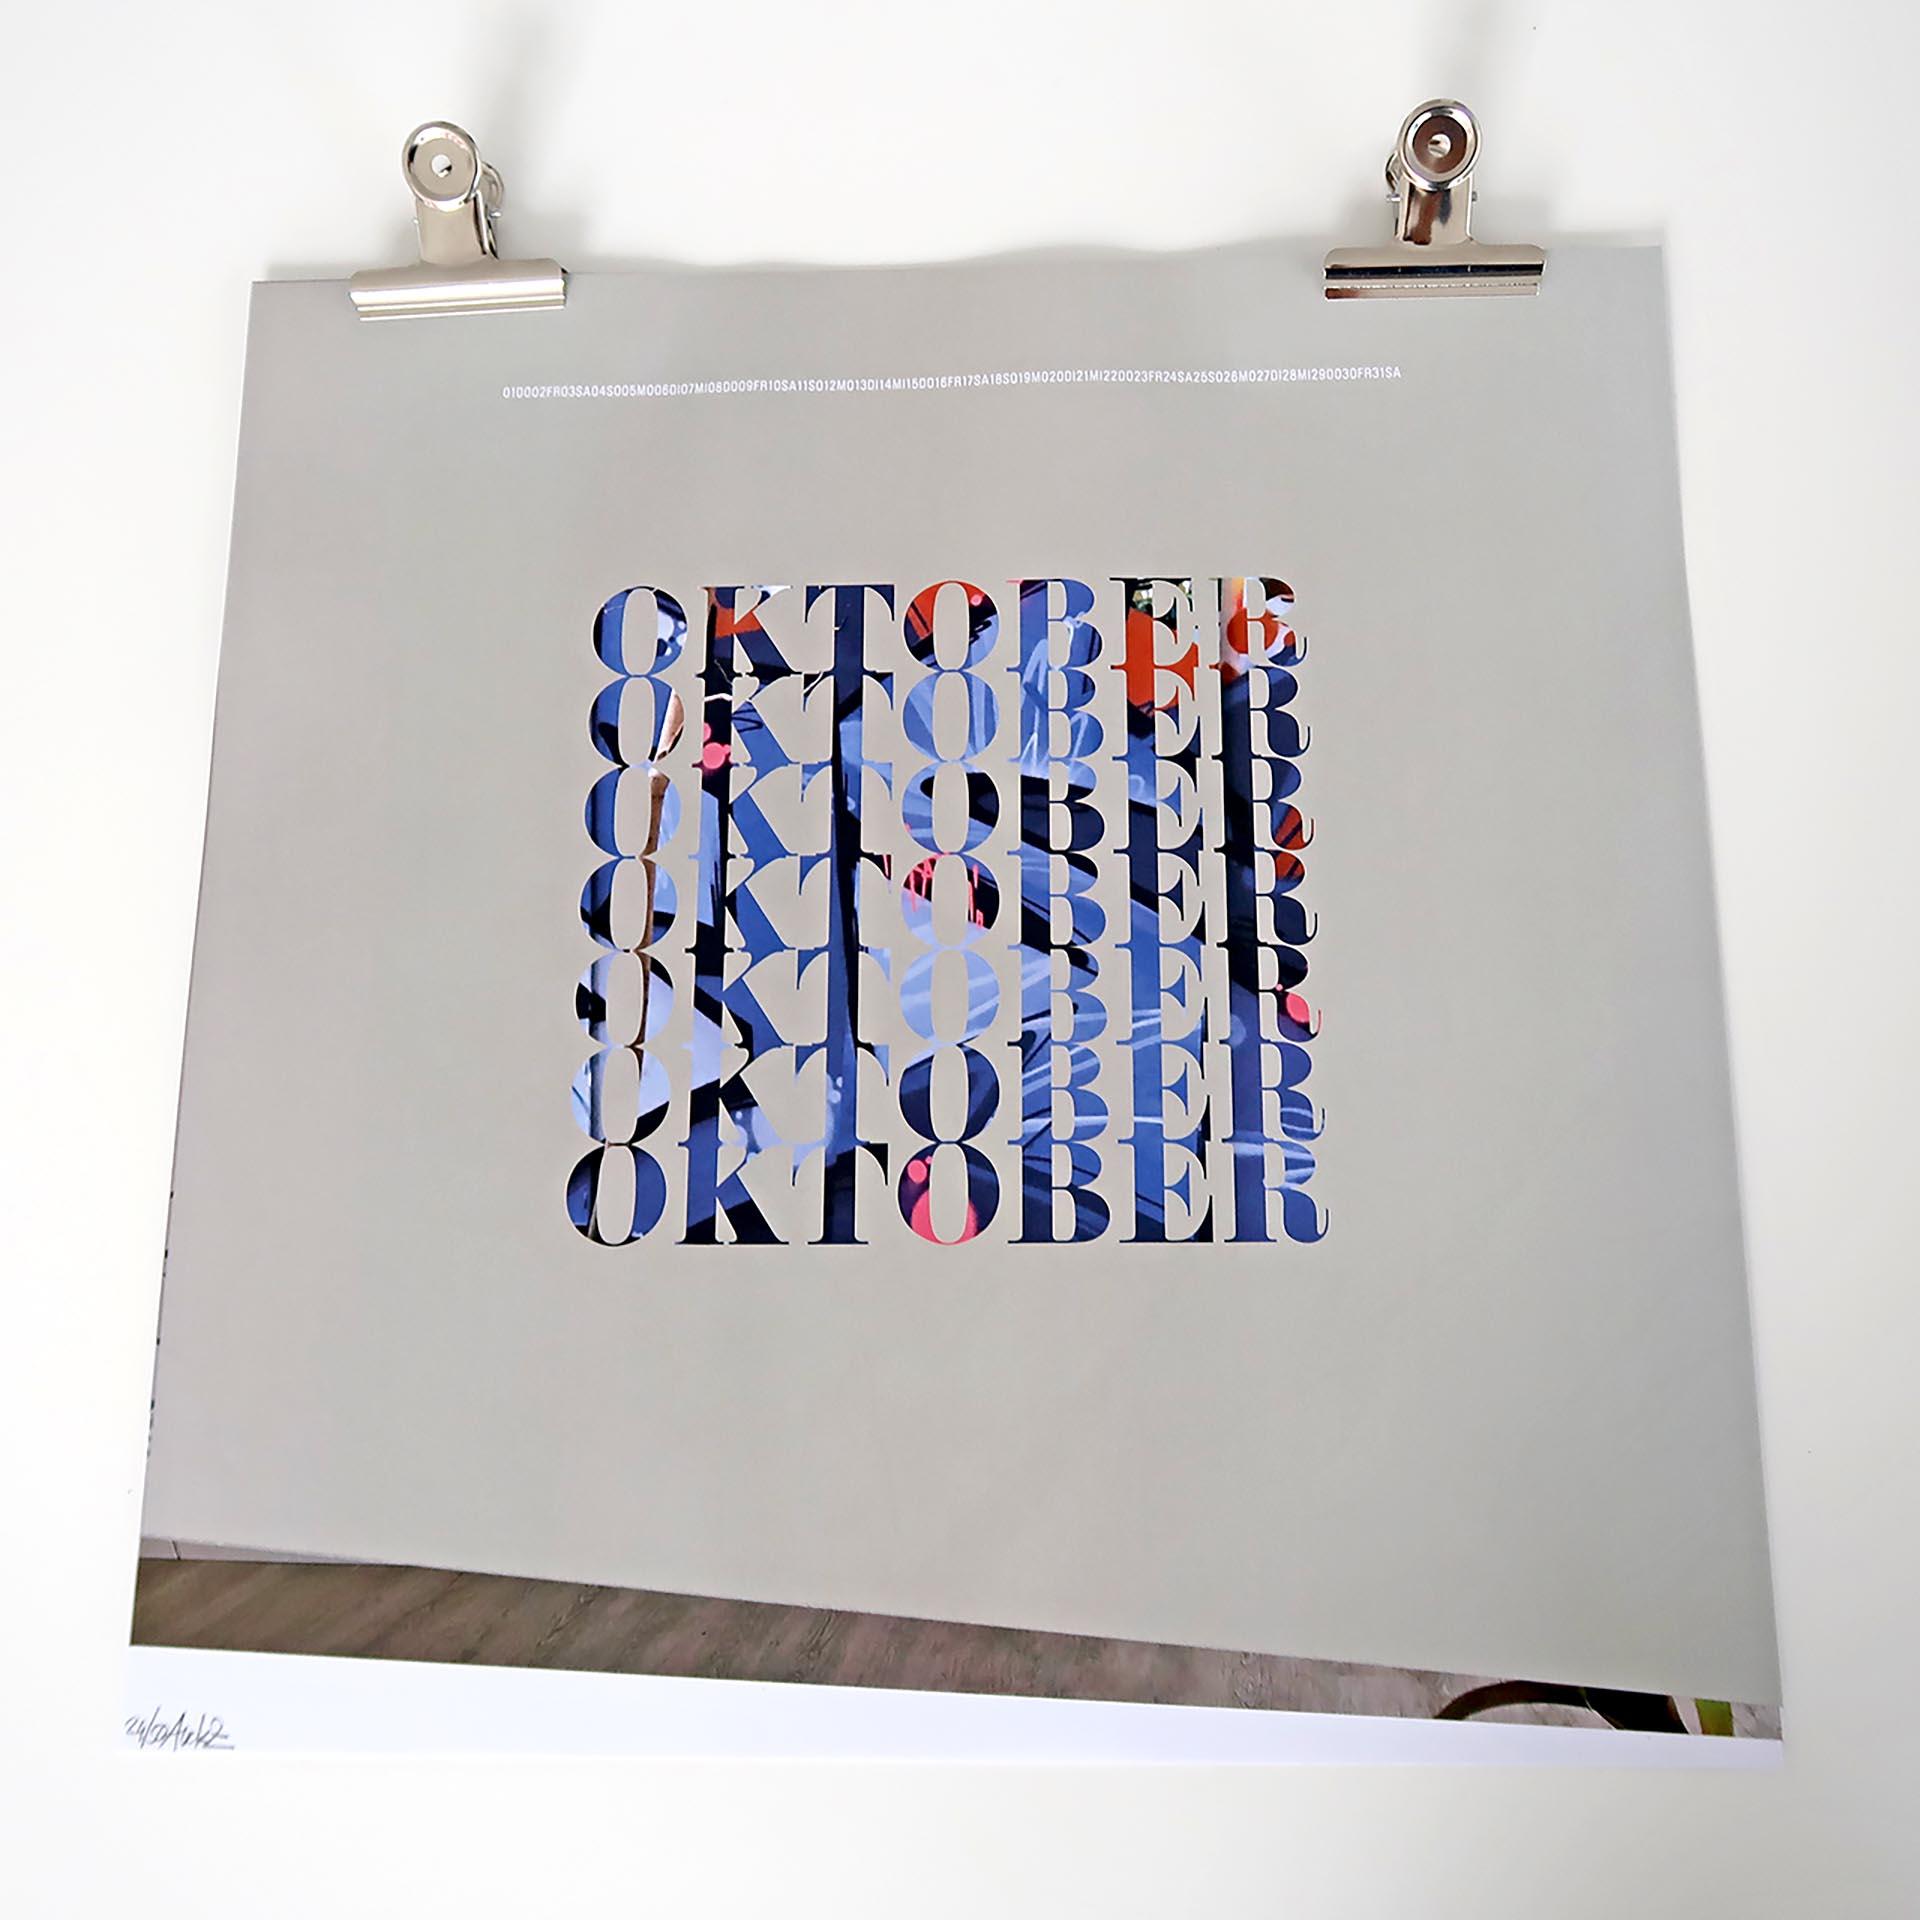 Graffiti, Design, Kalender, Auckz, 2020, Münster, Studio, Grafik, Layout, Kunst